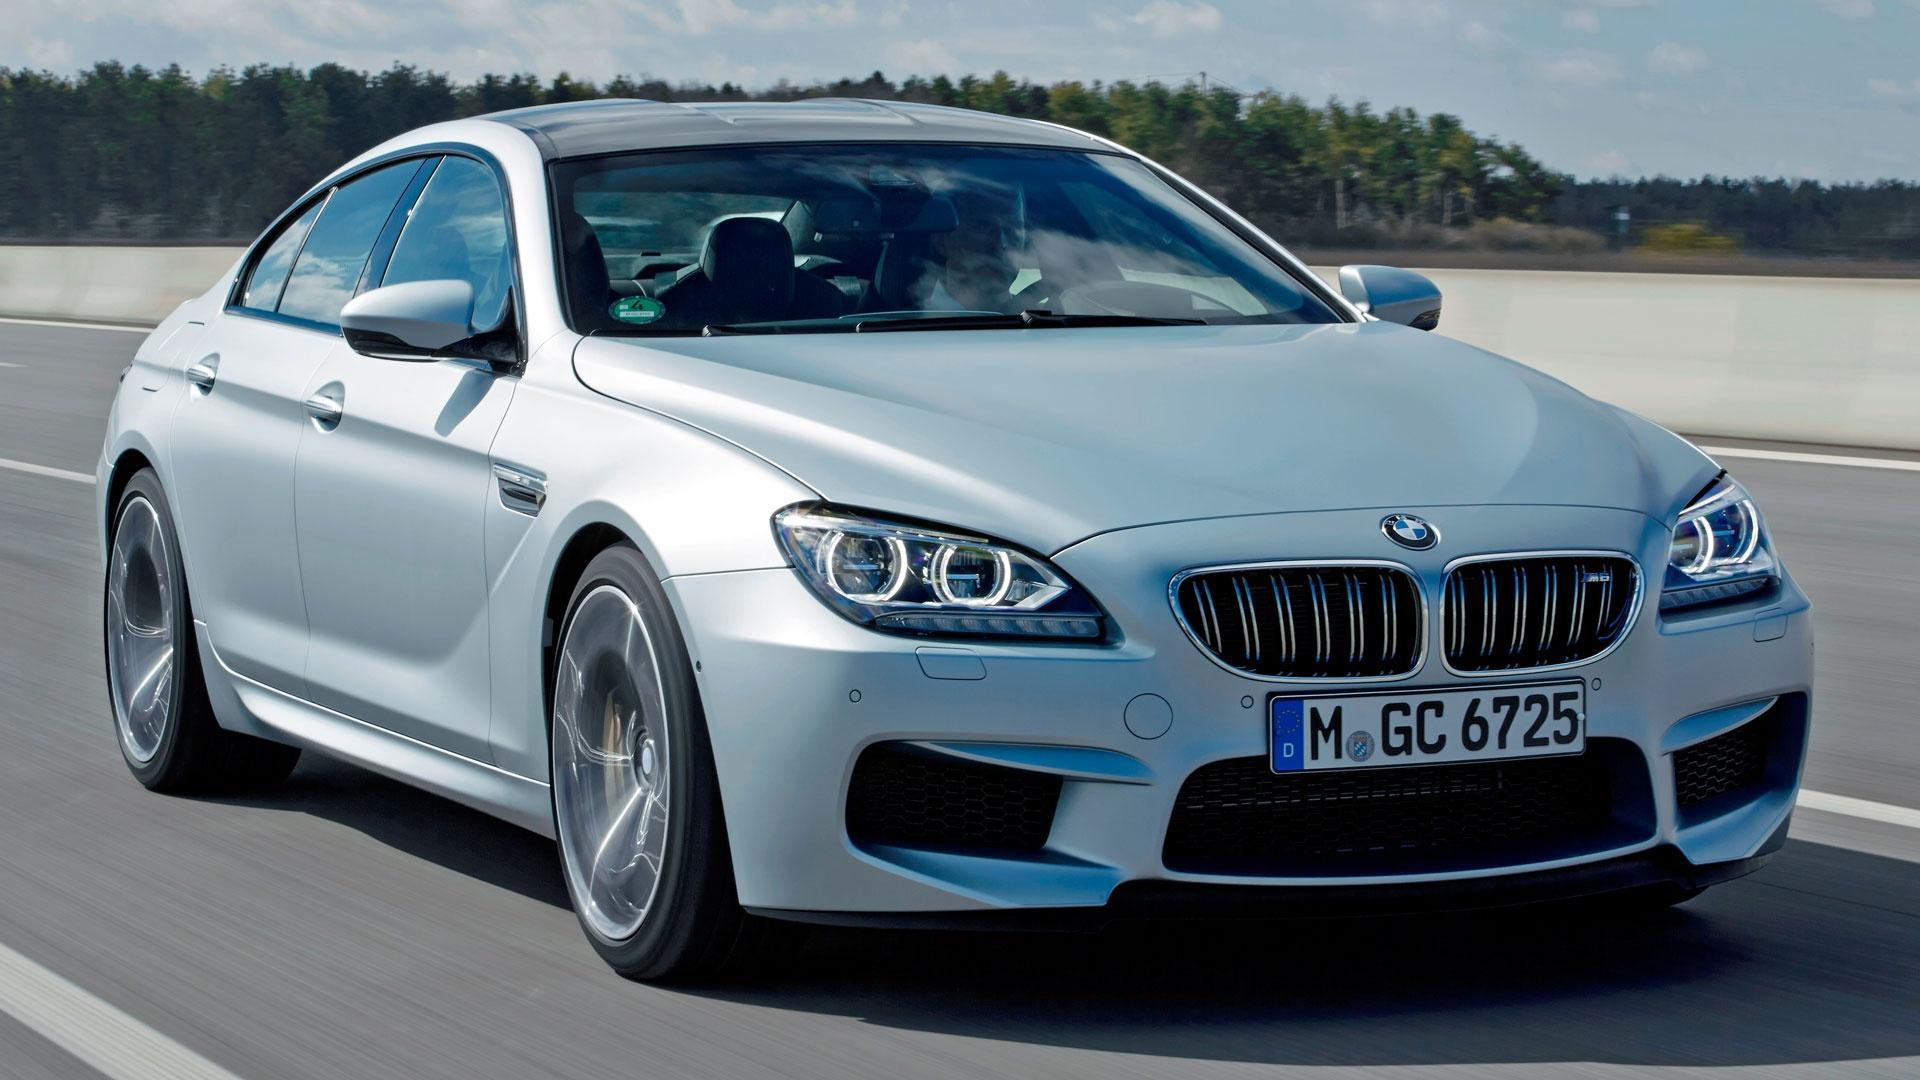 2014 BMW M6 Gran Coupe & 2014 Kia Cadenza image